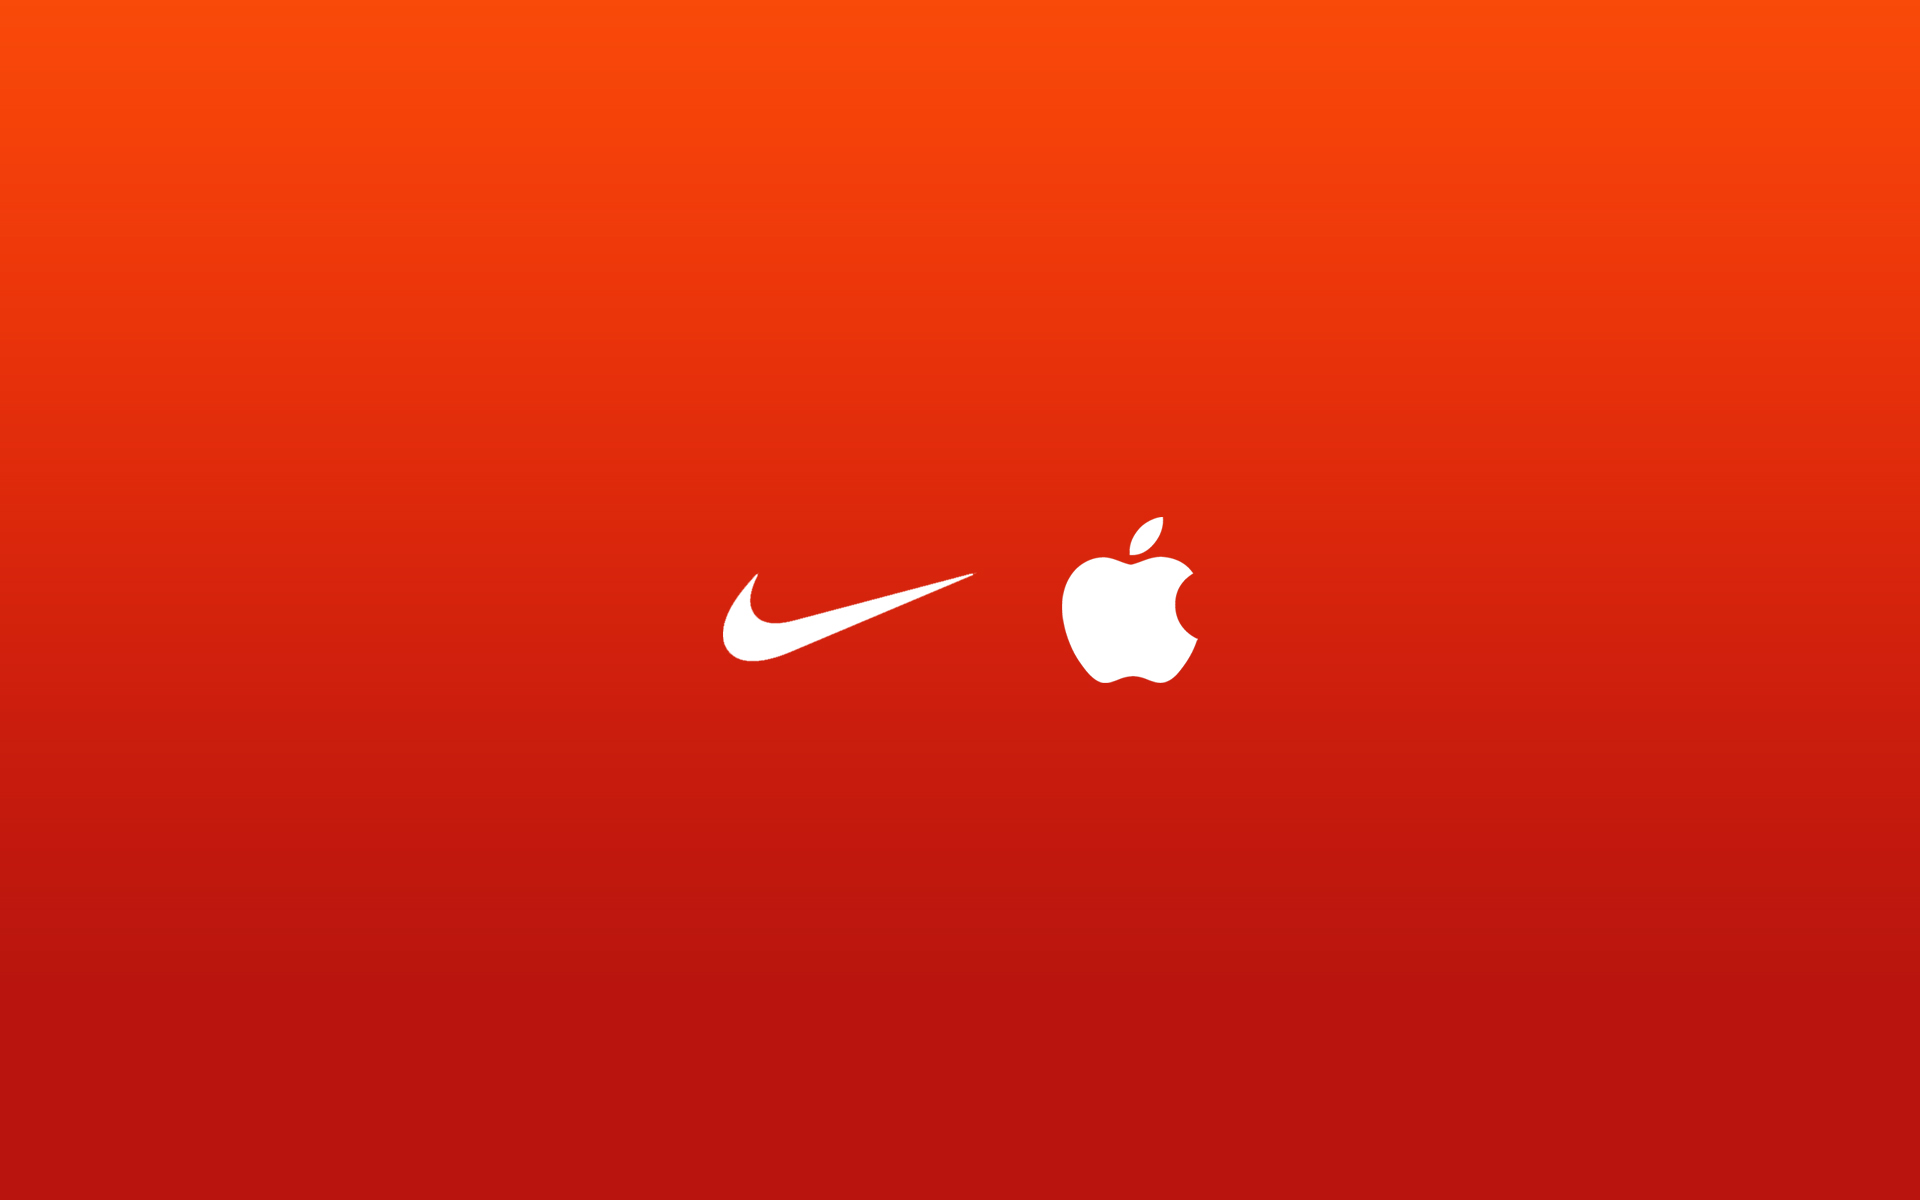 Free Download Nike Wallpaper 774 1920 X 1200 Wallpaperlayercom